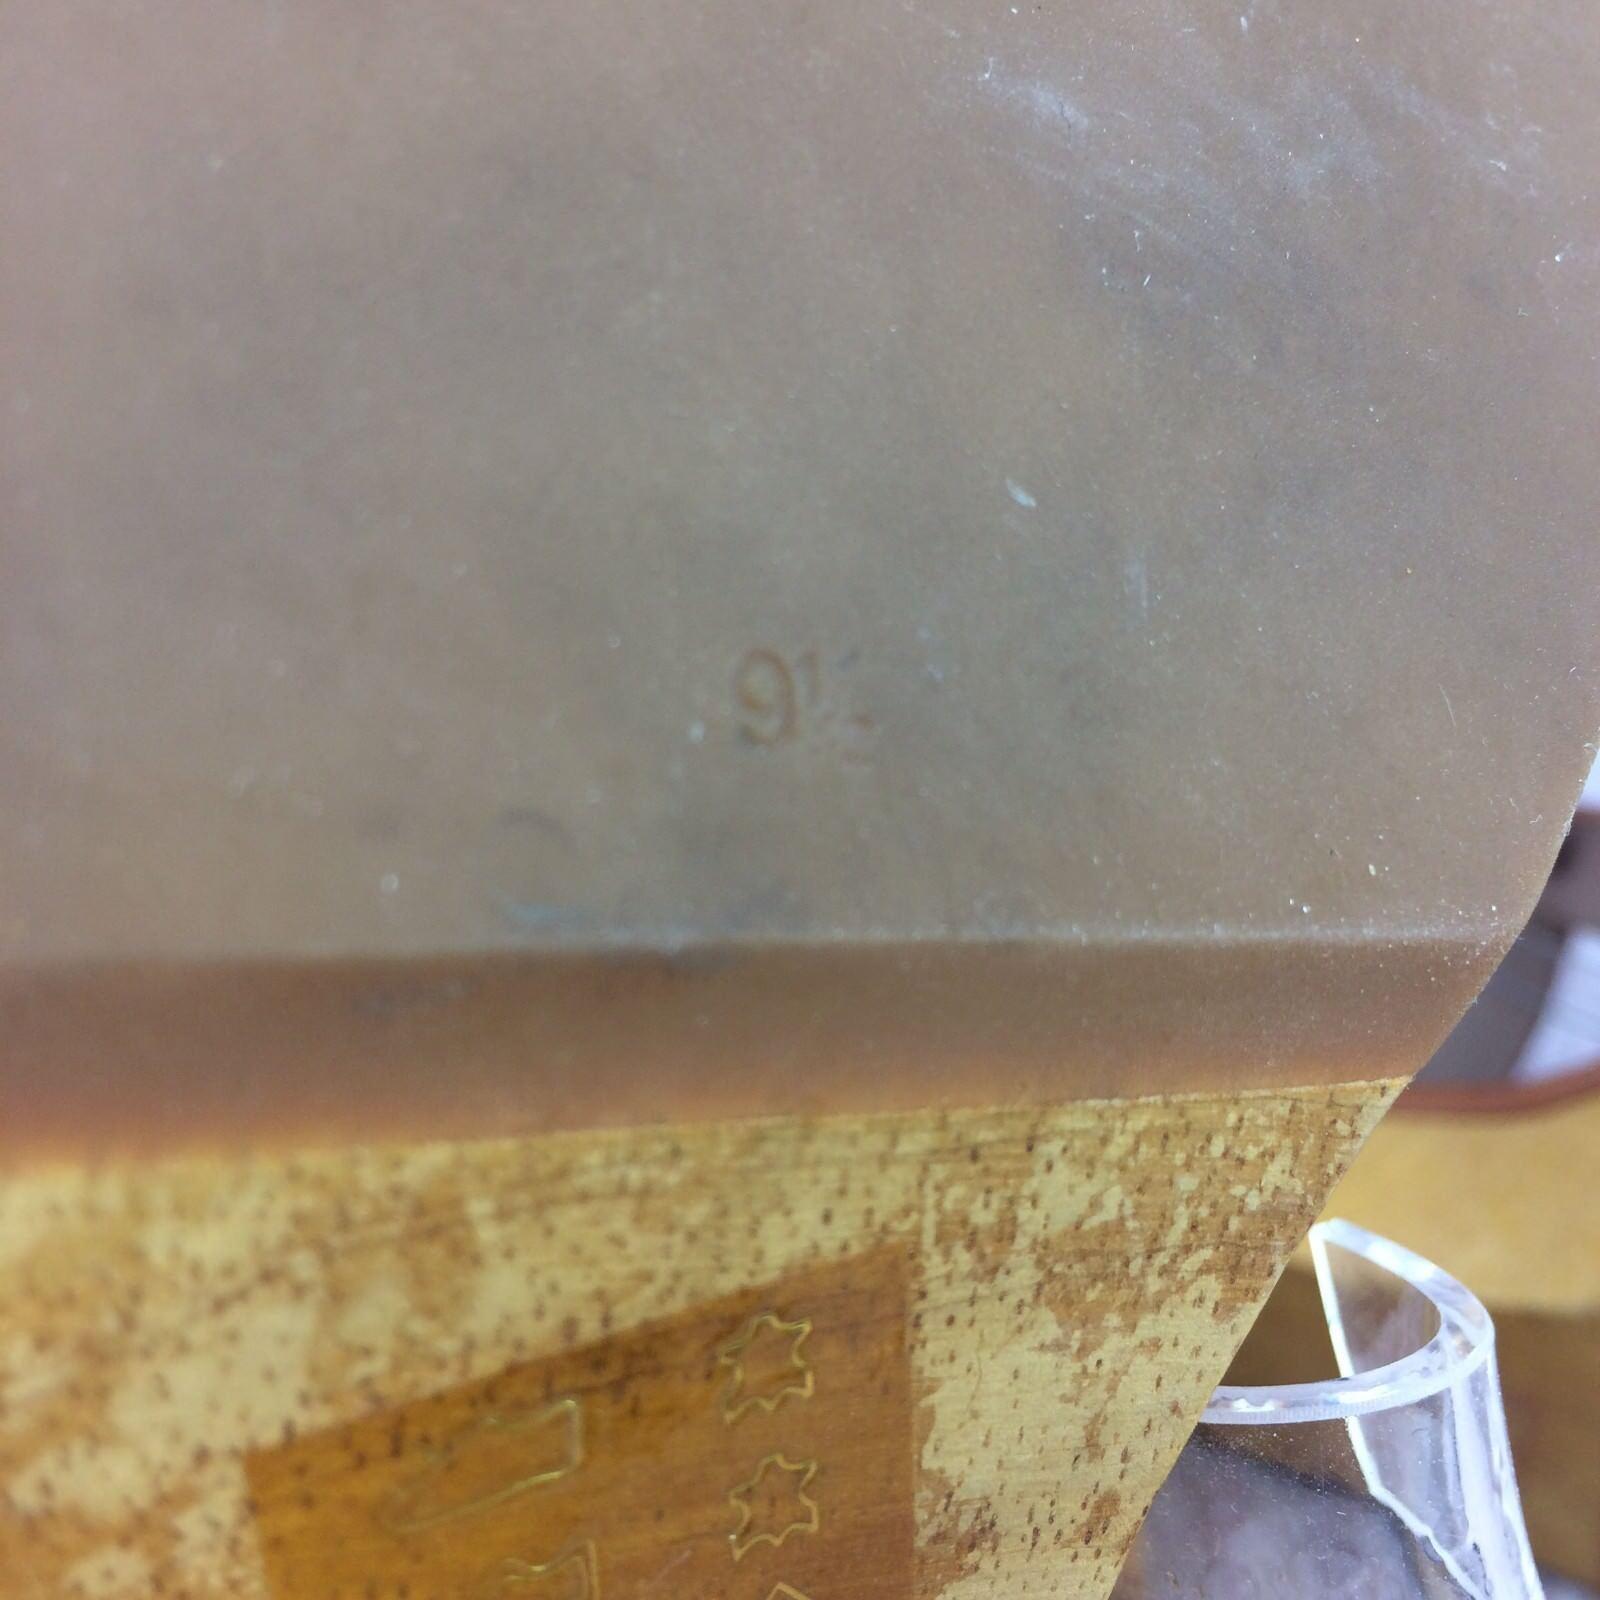 Madewell Irving Sandale Braun Leder Wood Sole Sole Sole Heels SOLD OUT online  Größe 9.5 8acb42